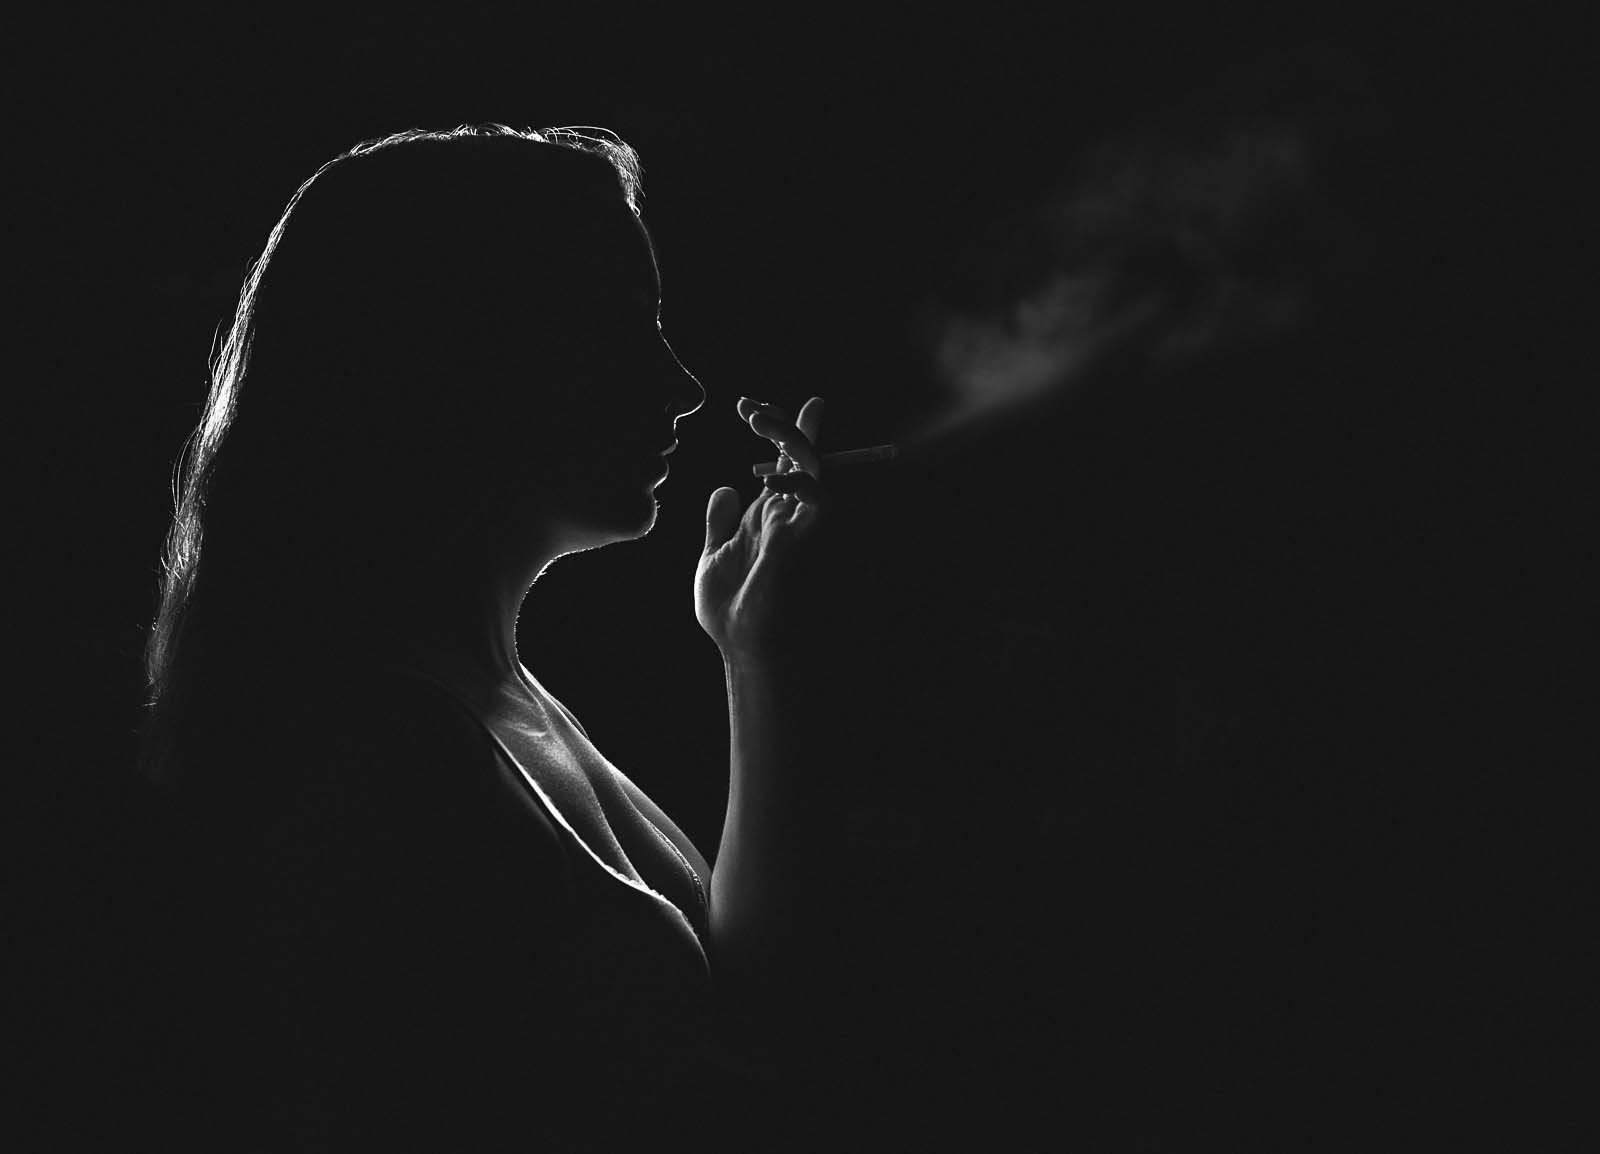 Self portrait using rim light by Megan Arndt to demonstrate creative photography method